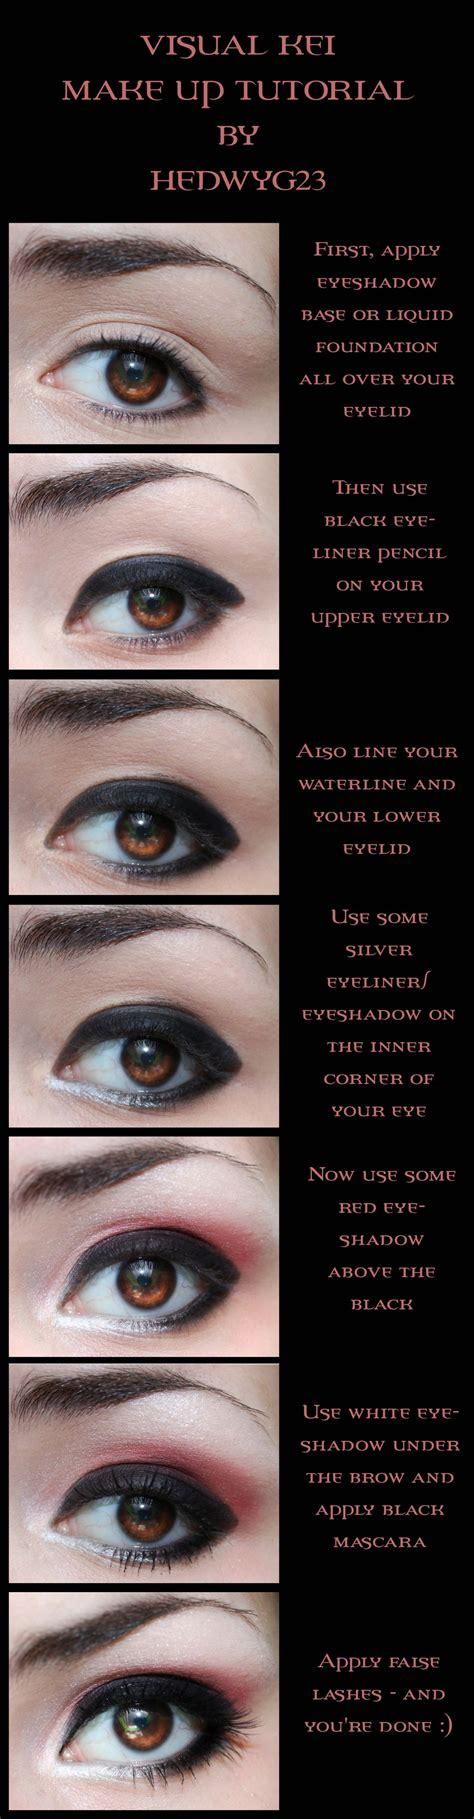 Tutorial Makeup Visual Kei | visual kei thathelpfulperson